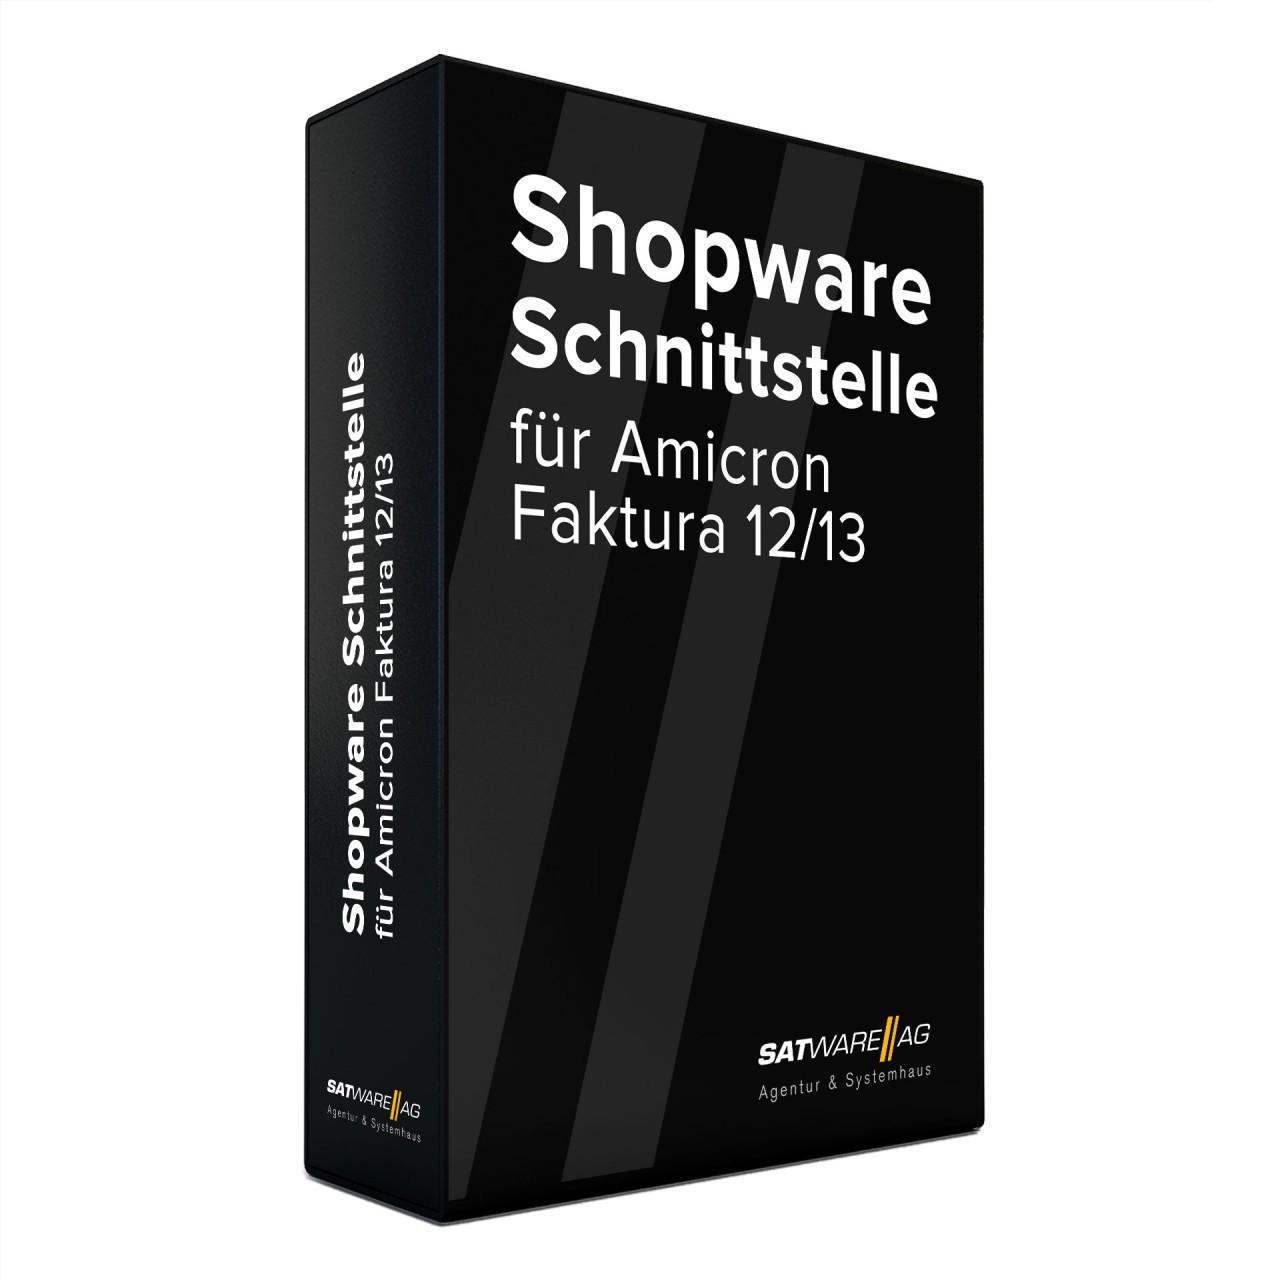 Amicron-Faktura-13-shopware-Varianten-Schnittstelle